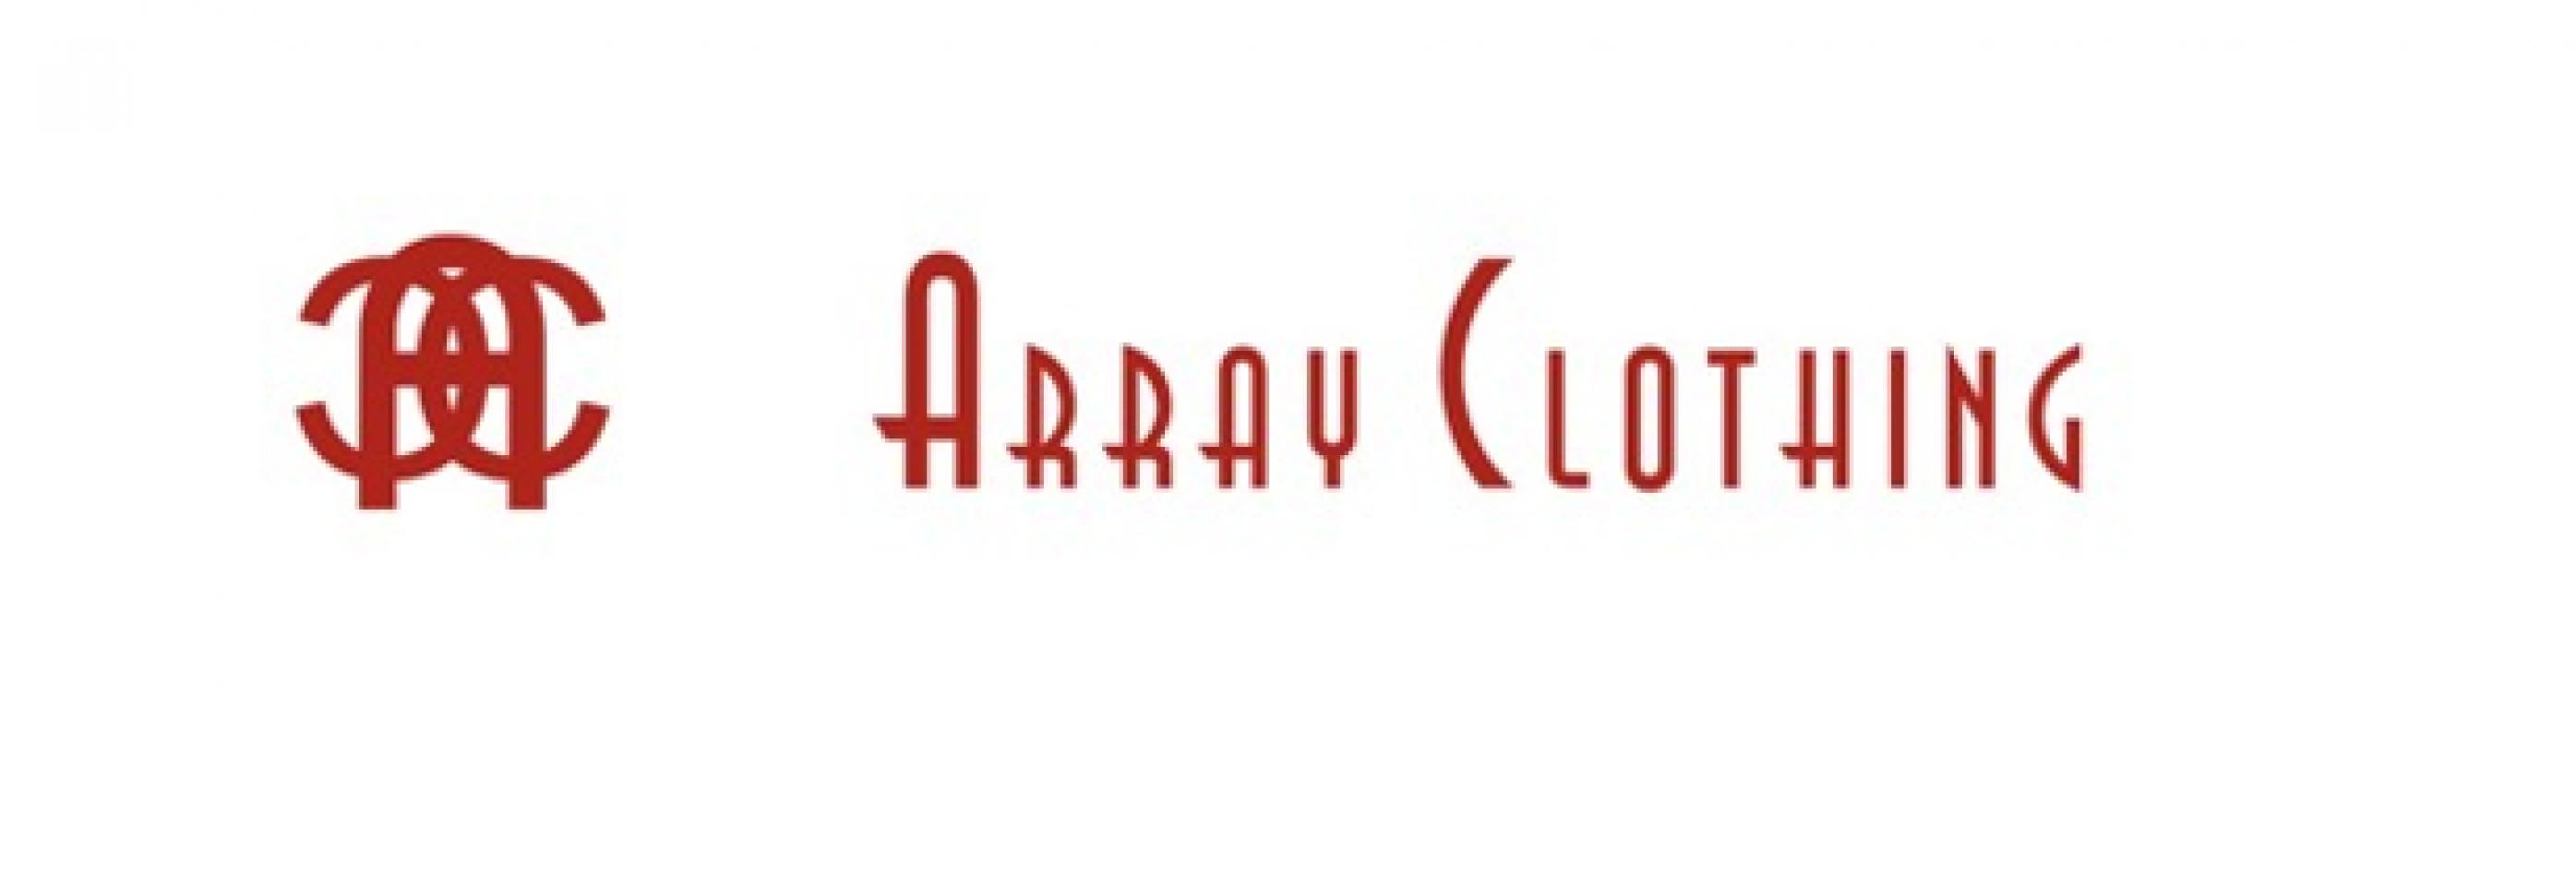 ARRAY CLOTHING